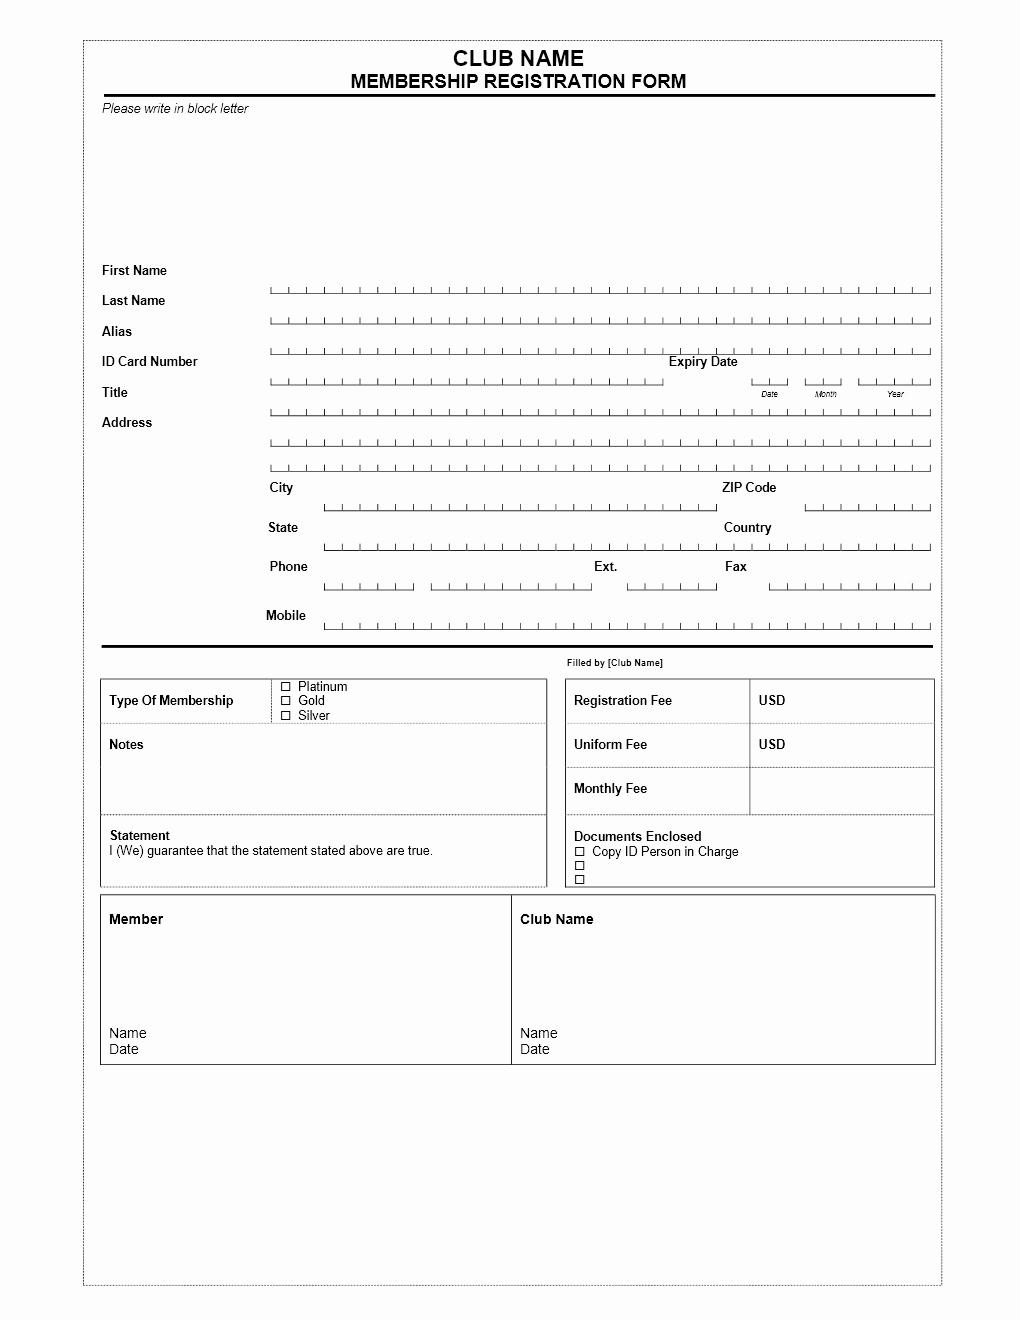 Membership Application Template Free New Club Membership Application form